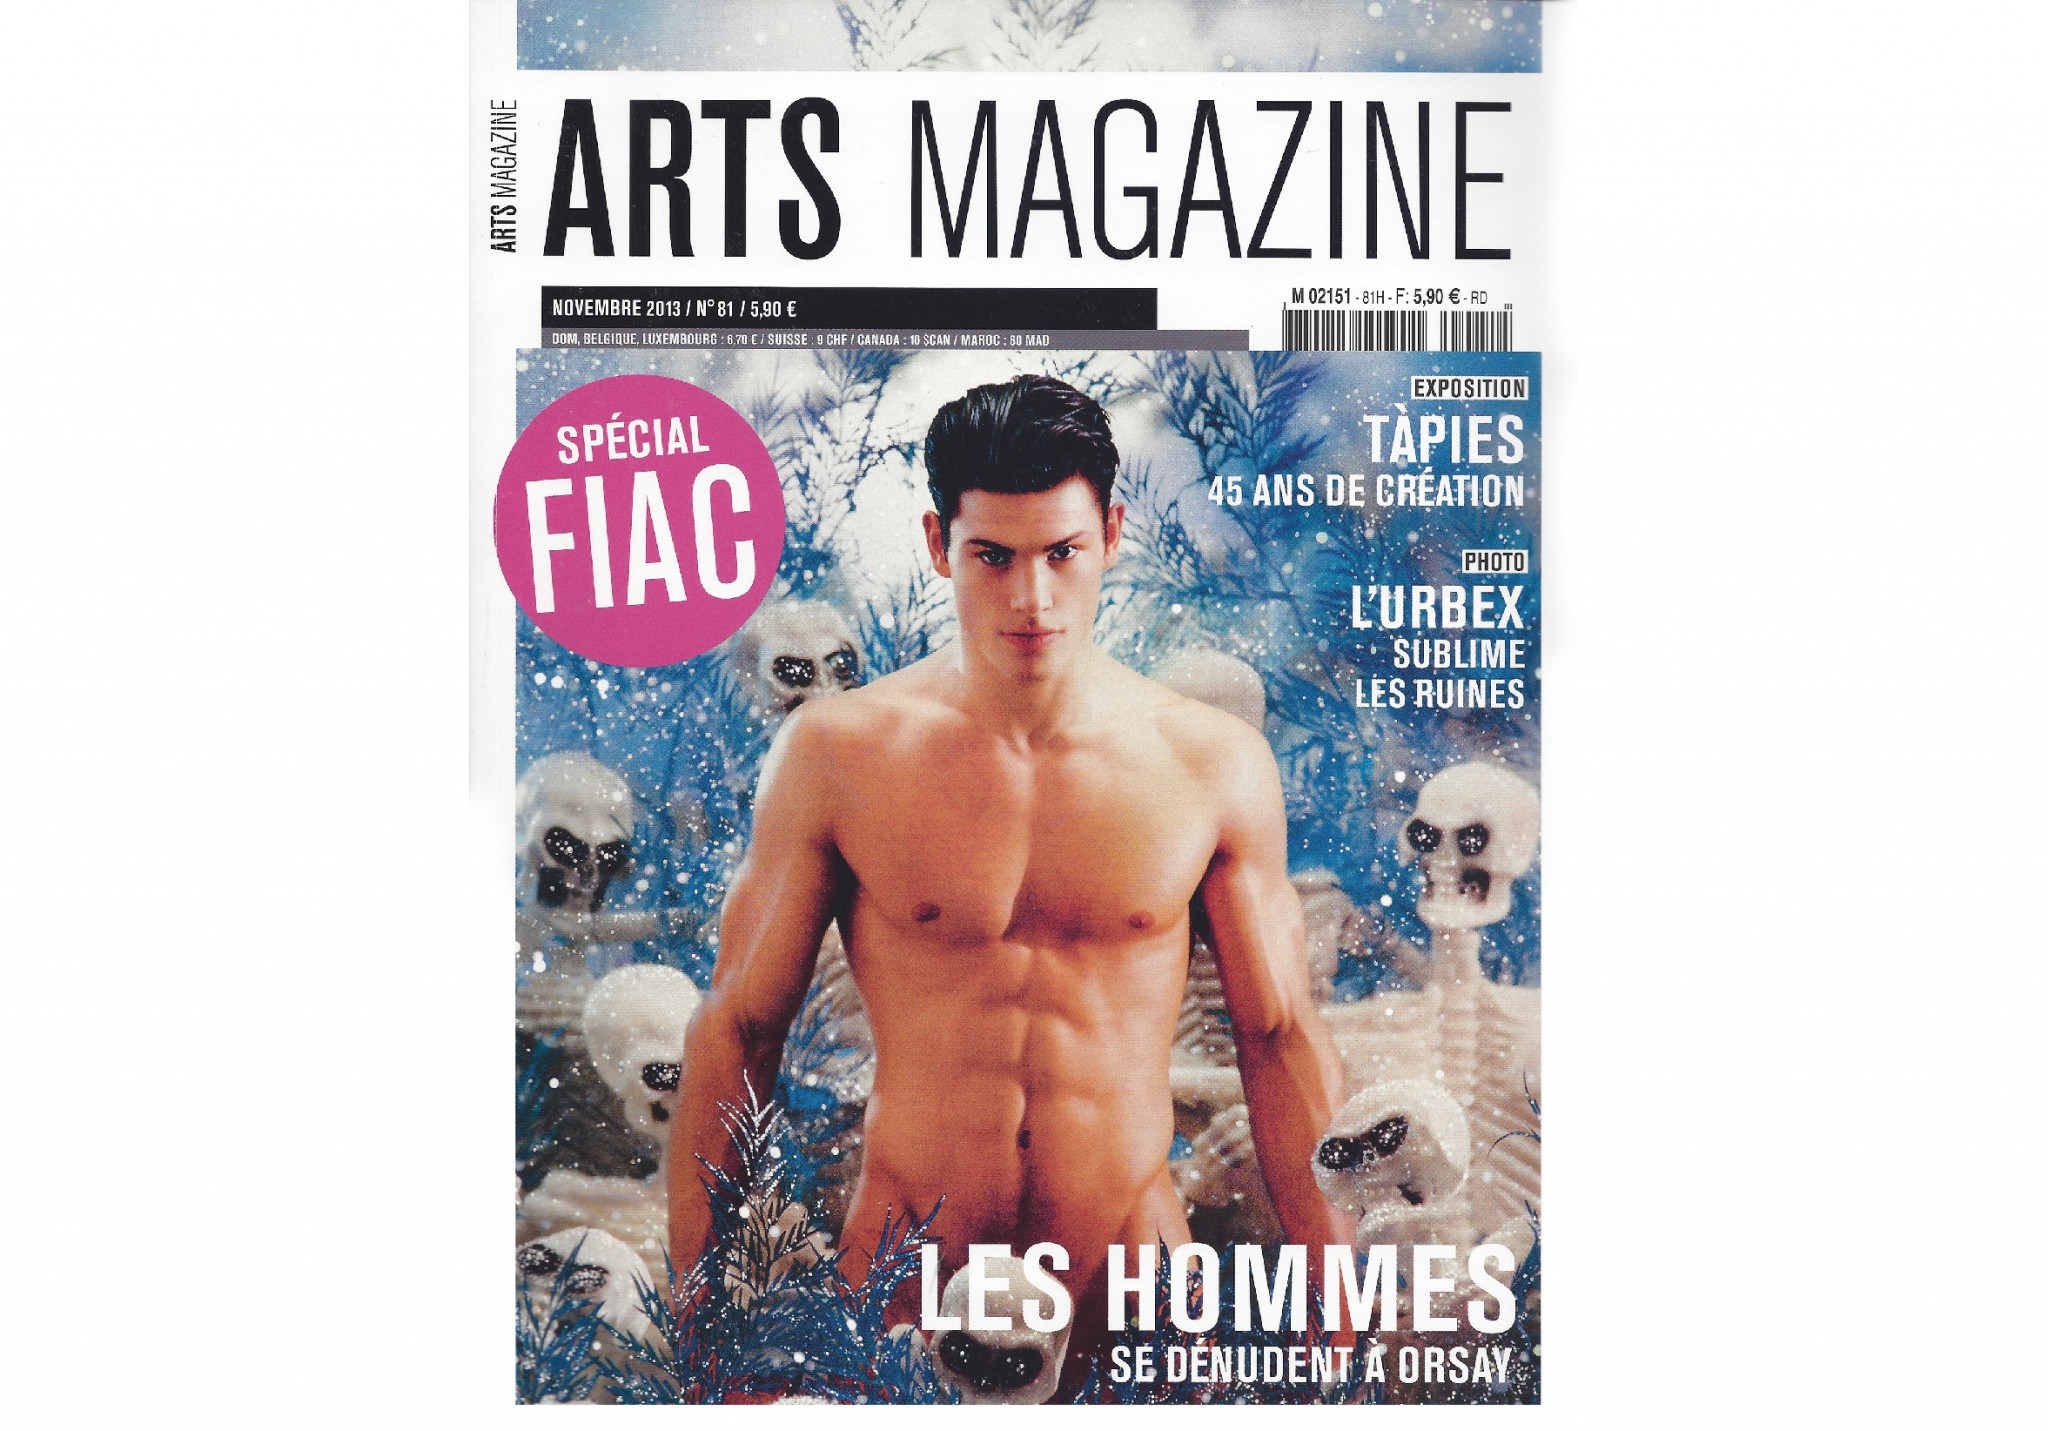 Artsmagazine1113 Page 1